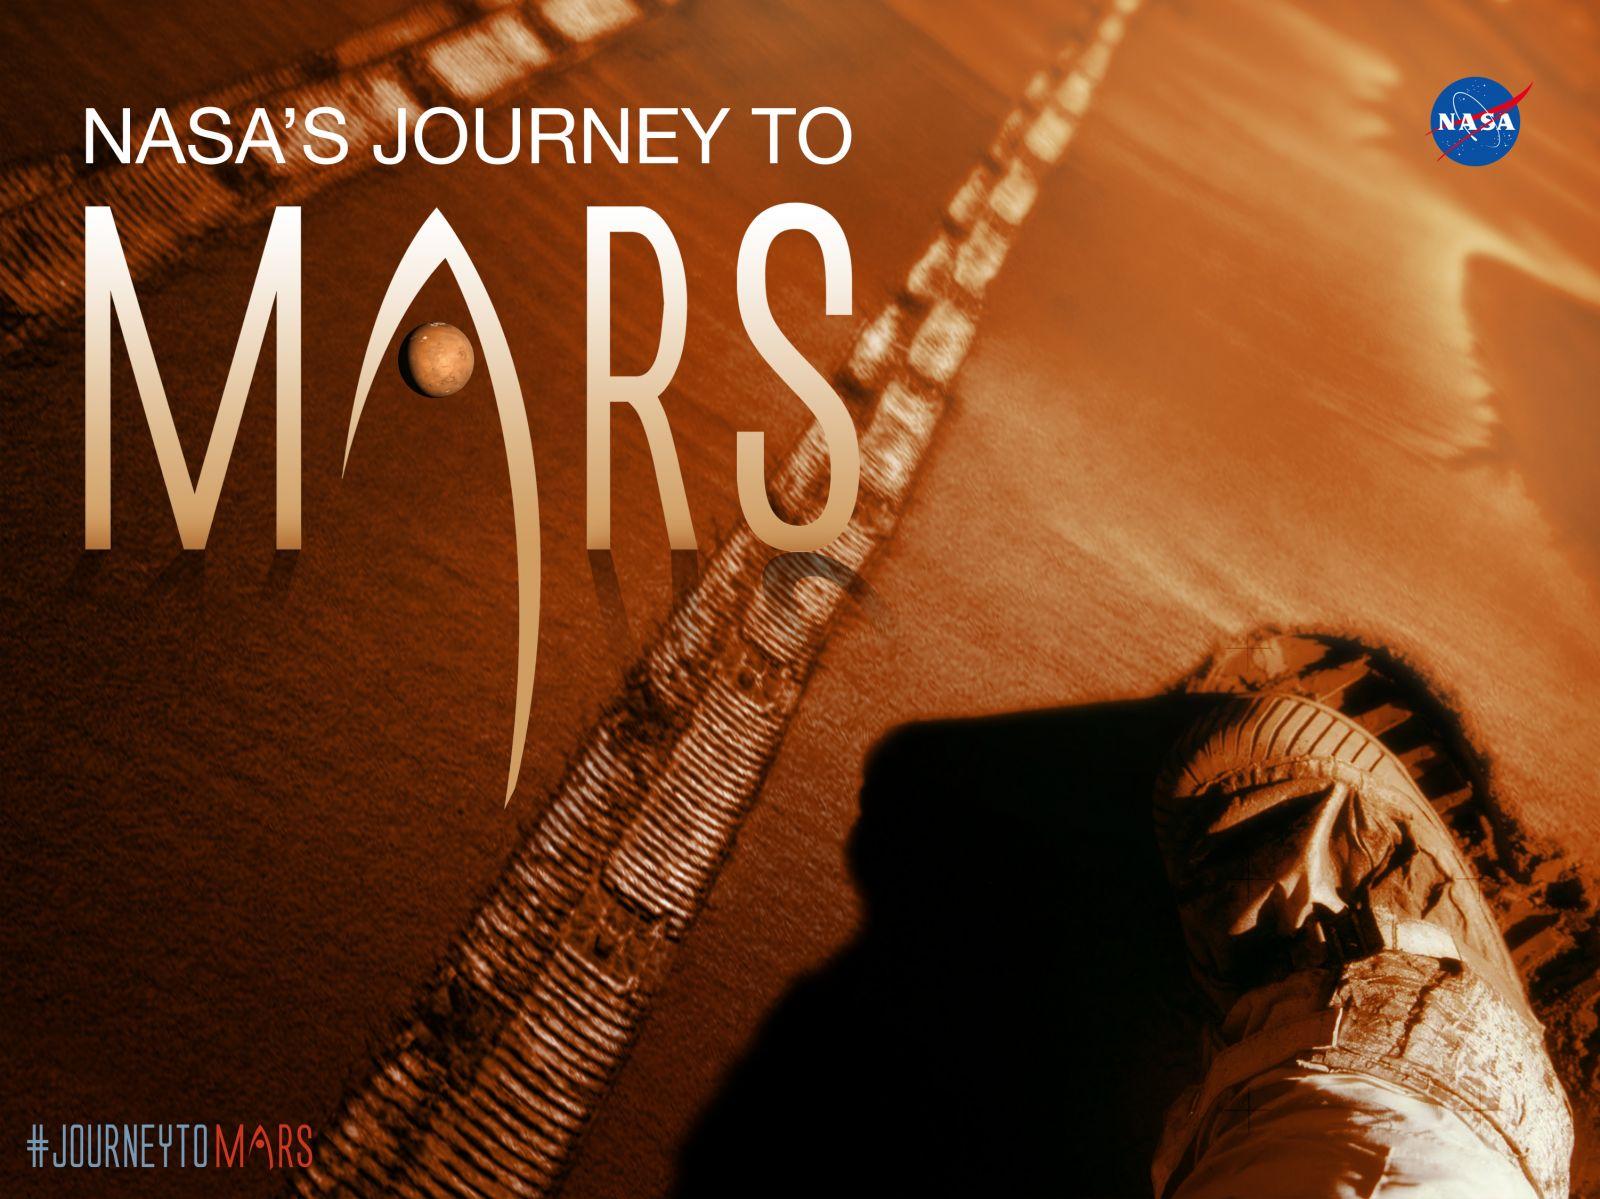 NASA Announces Journey to Mars Challenge   NASA